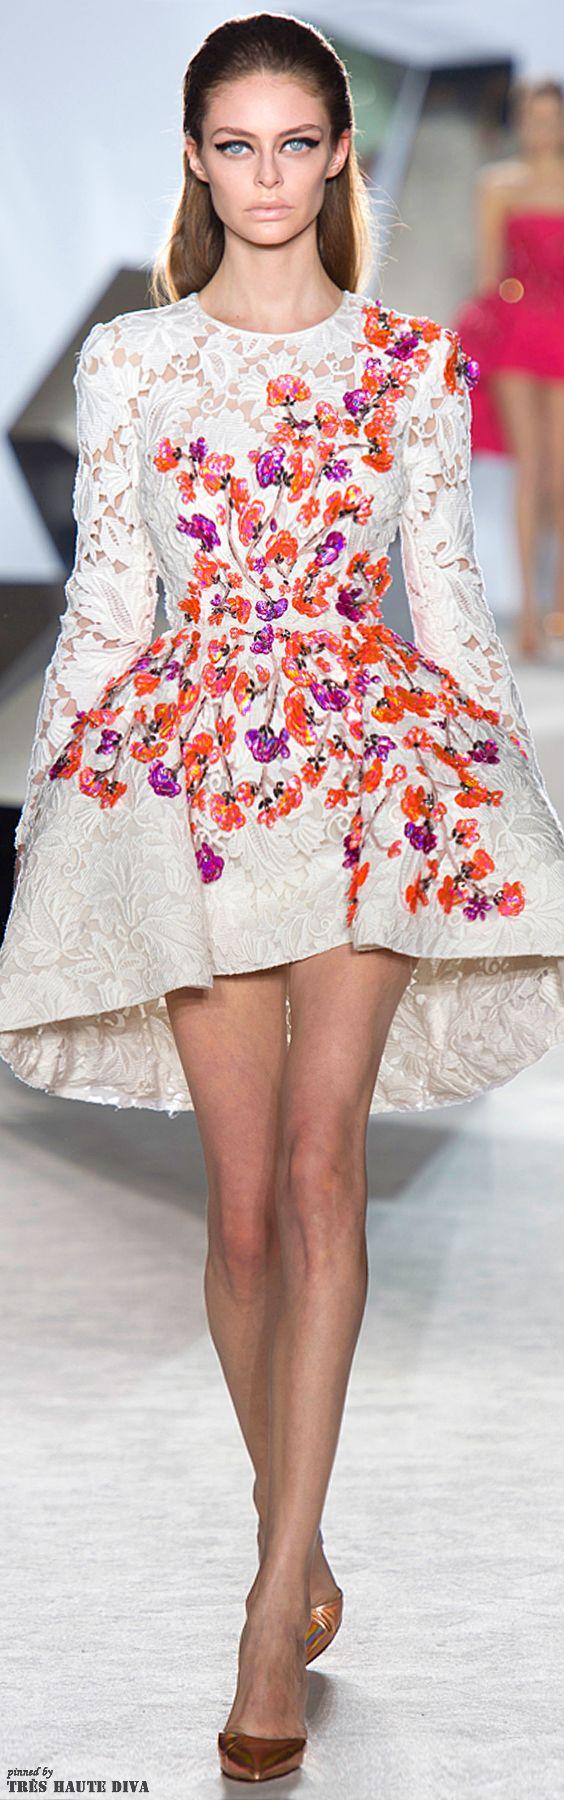 More than obsessed ❤ | Giambattista Valli Spring 2014 Couture www ...